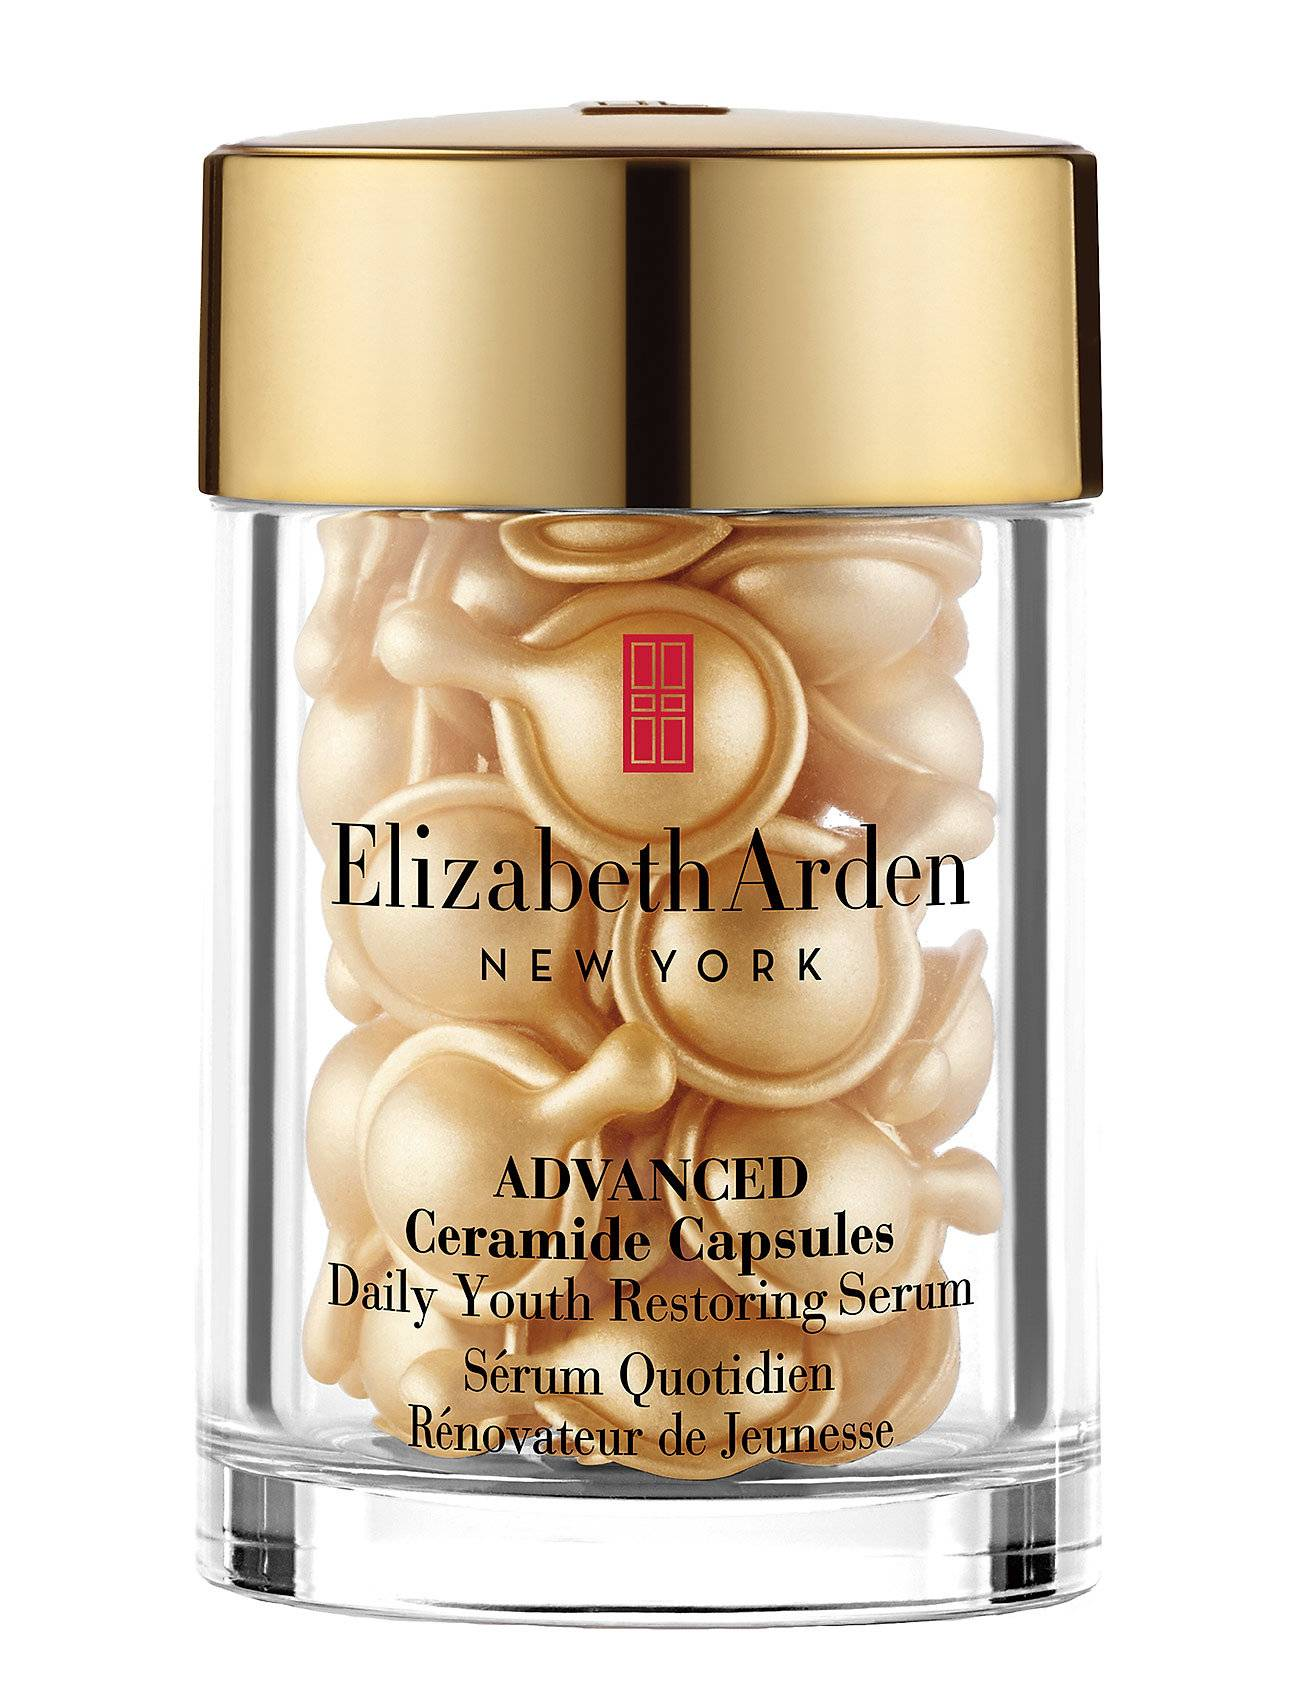 Elizabeth Arden Ceramide Capsules Restoring Serum 30pcs Seerumi Kasvot Ihonhoito Nude Elizabeth Arden